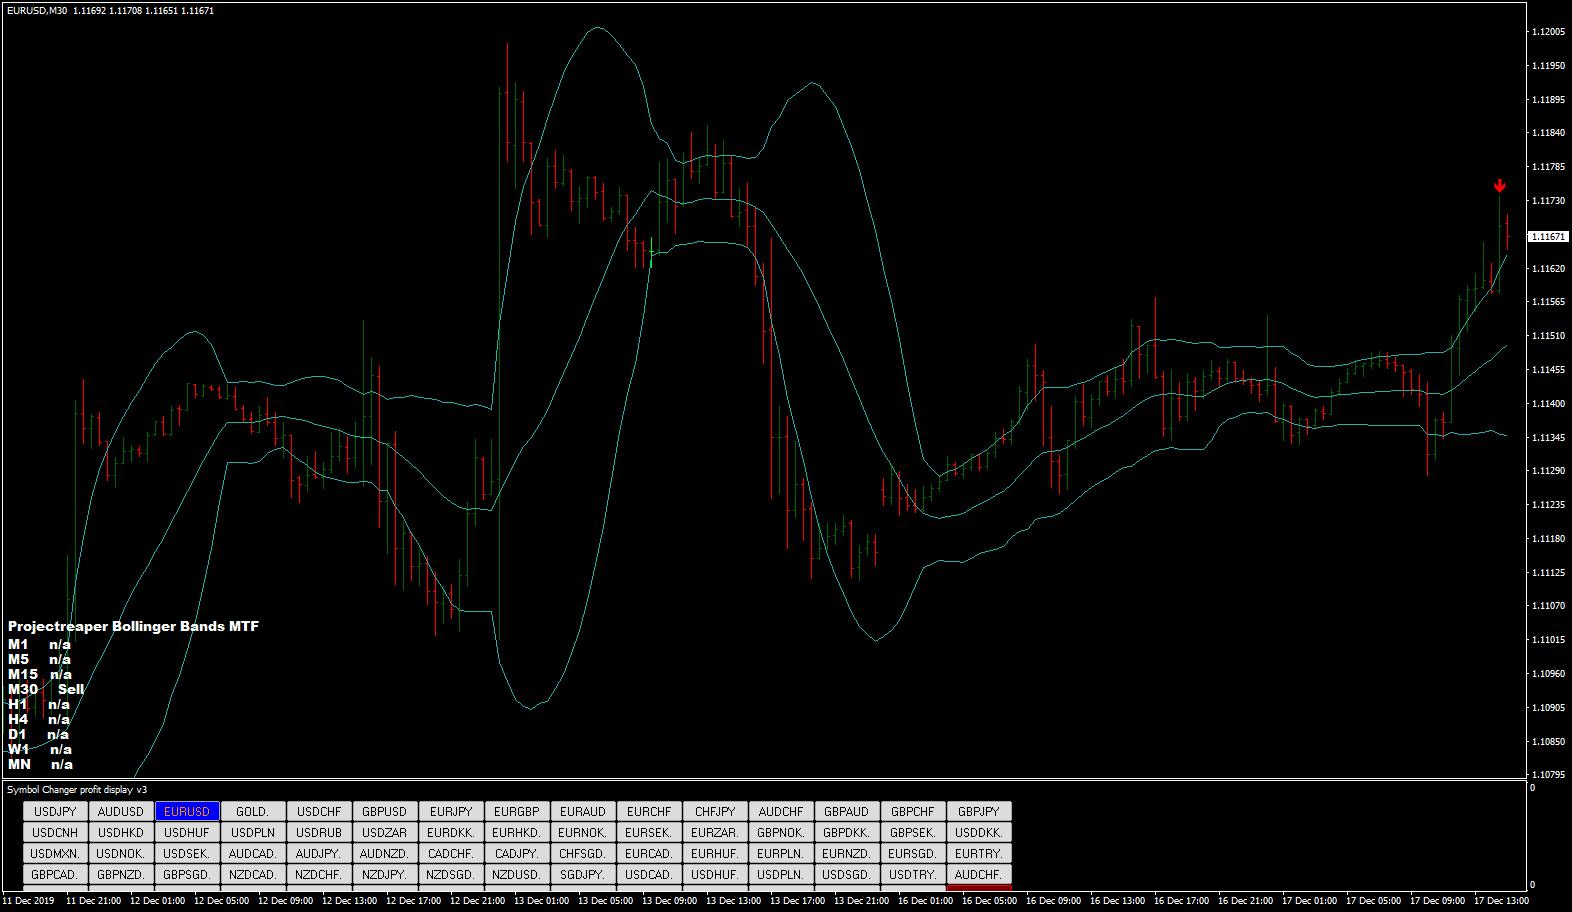 %B Indicator [ChartSchool]